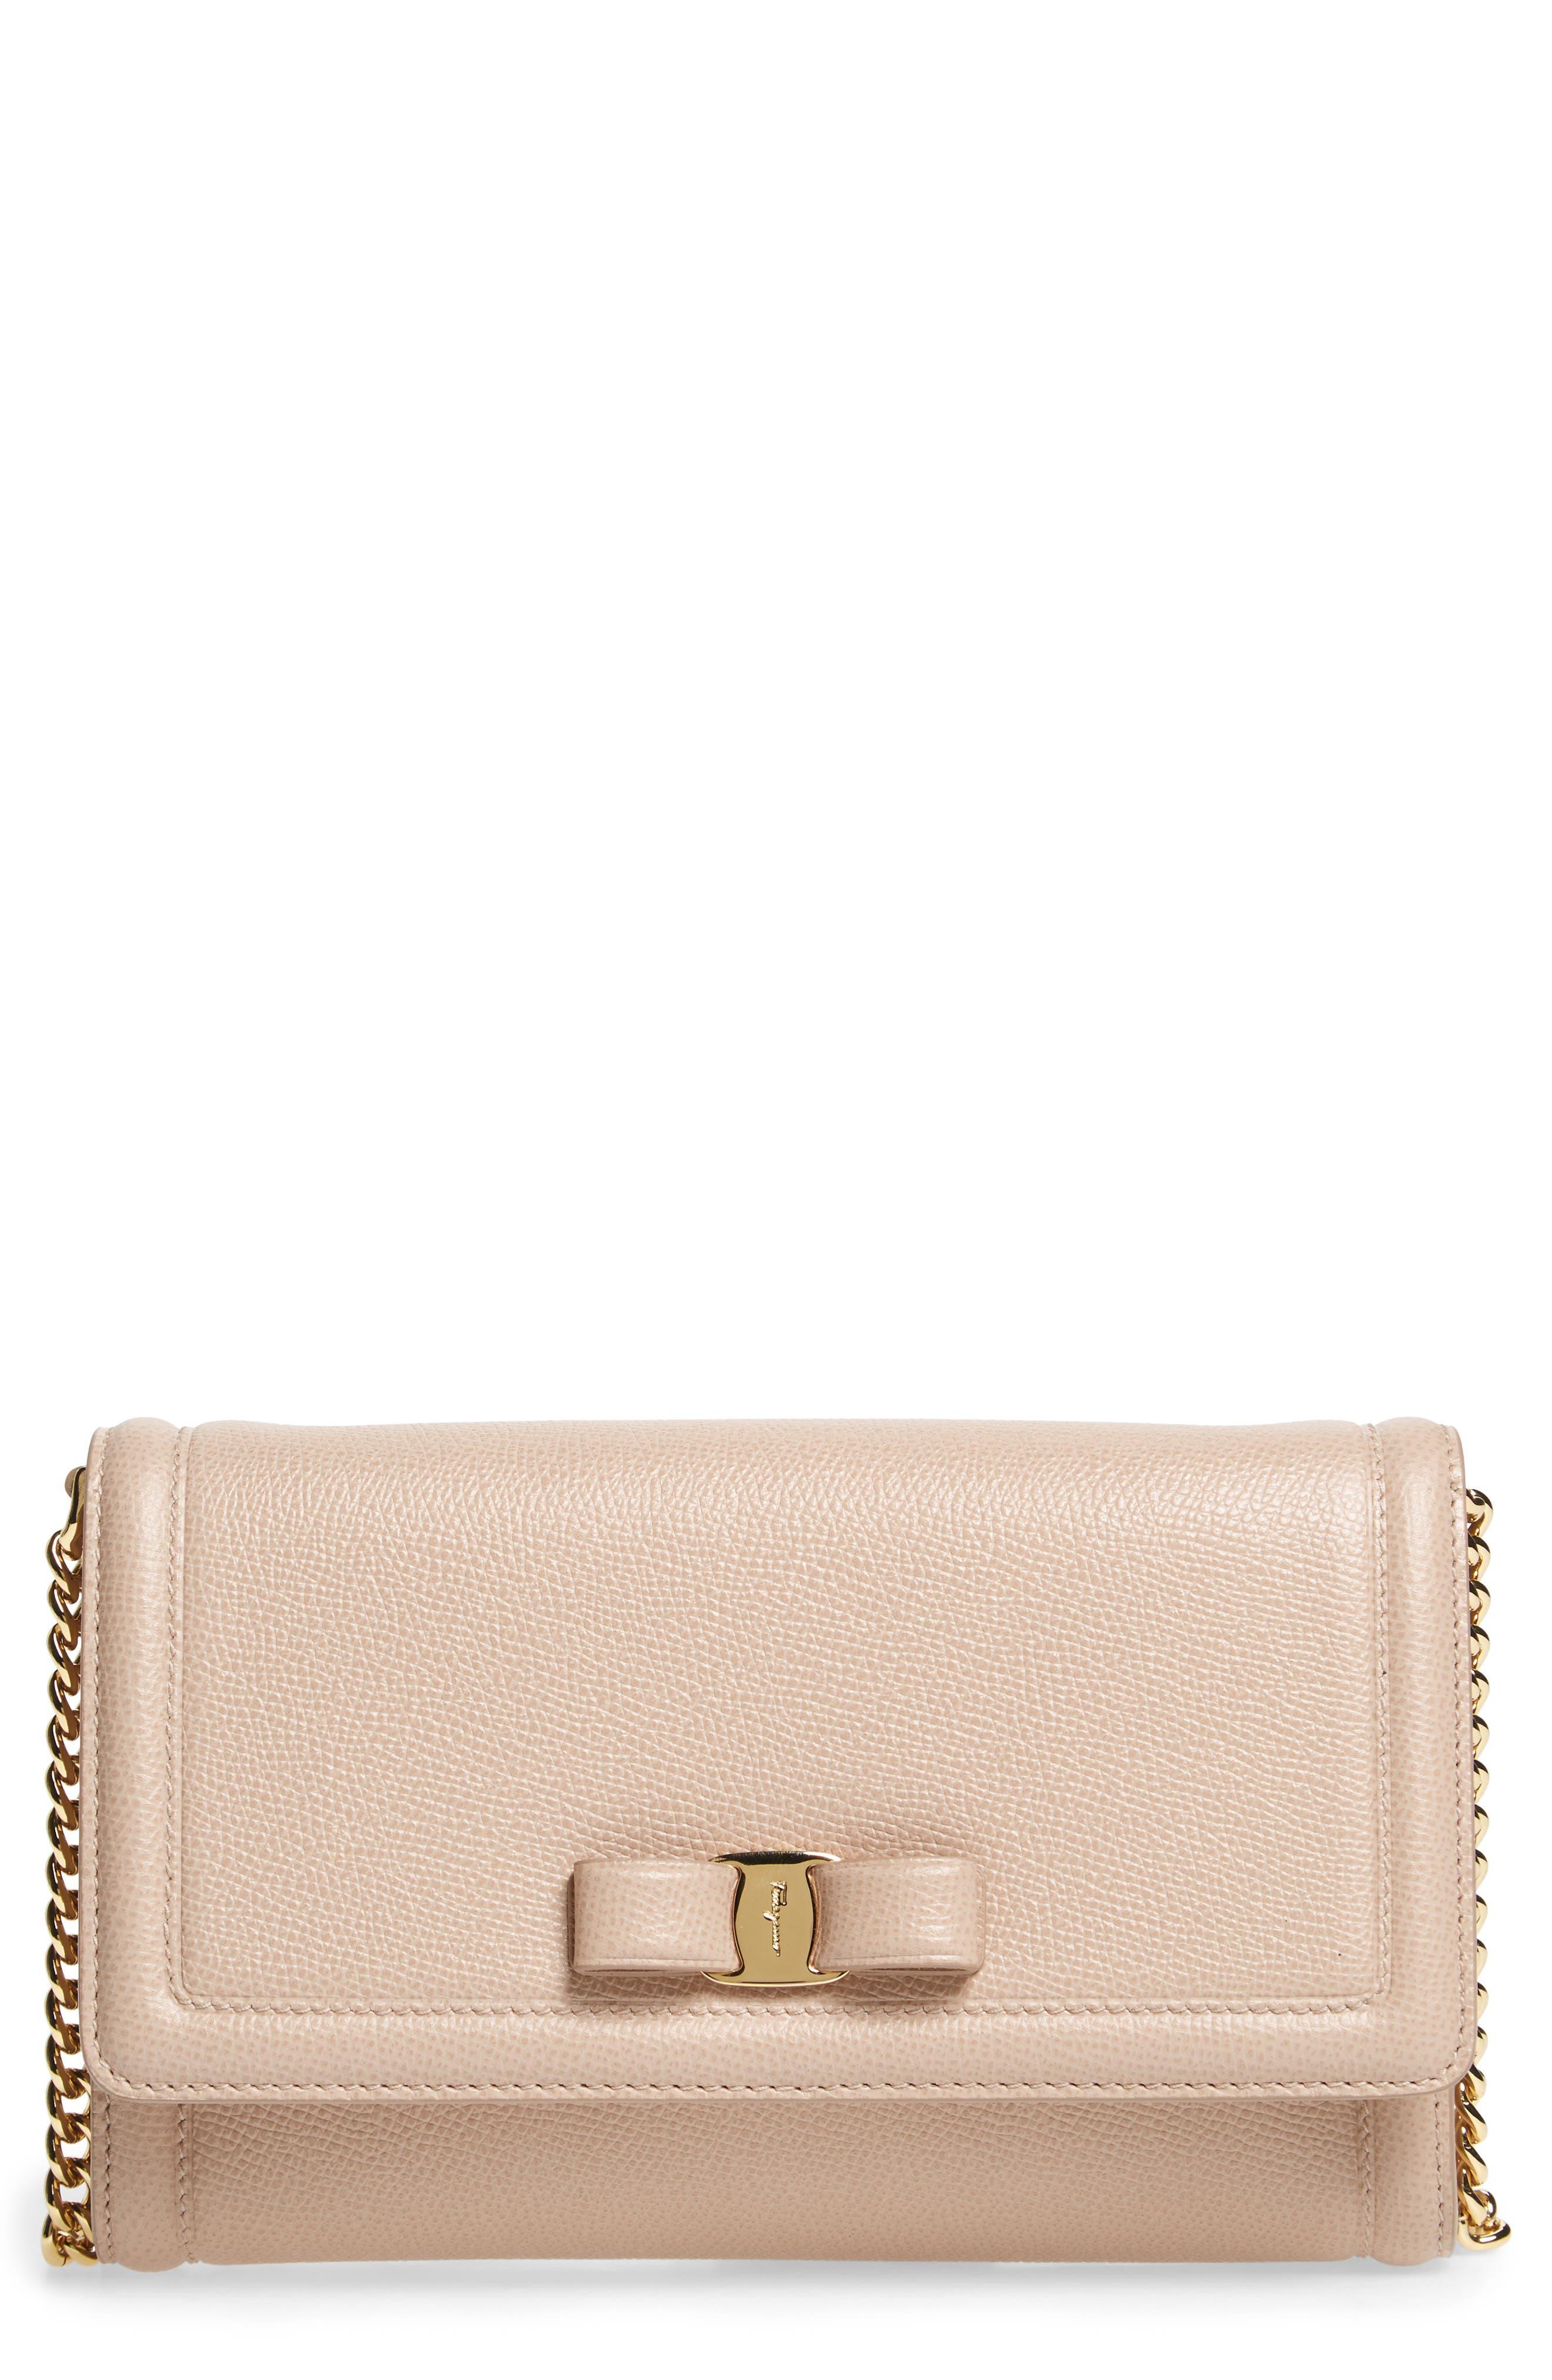 Main Image - Salvatore Ferragamo Mini Vara Leather Crossbody Bag